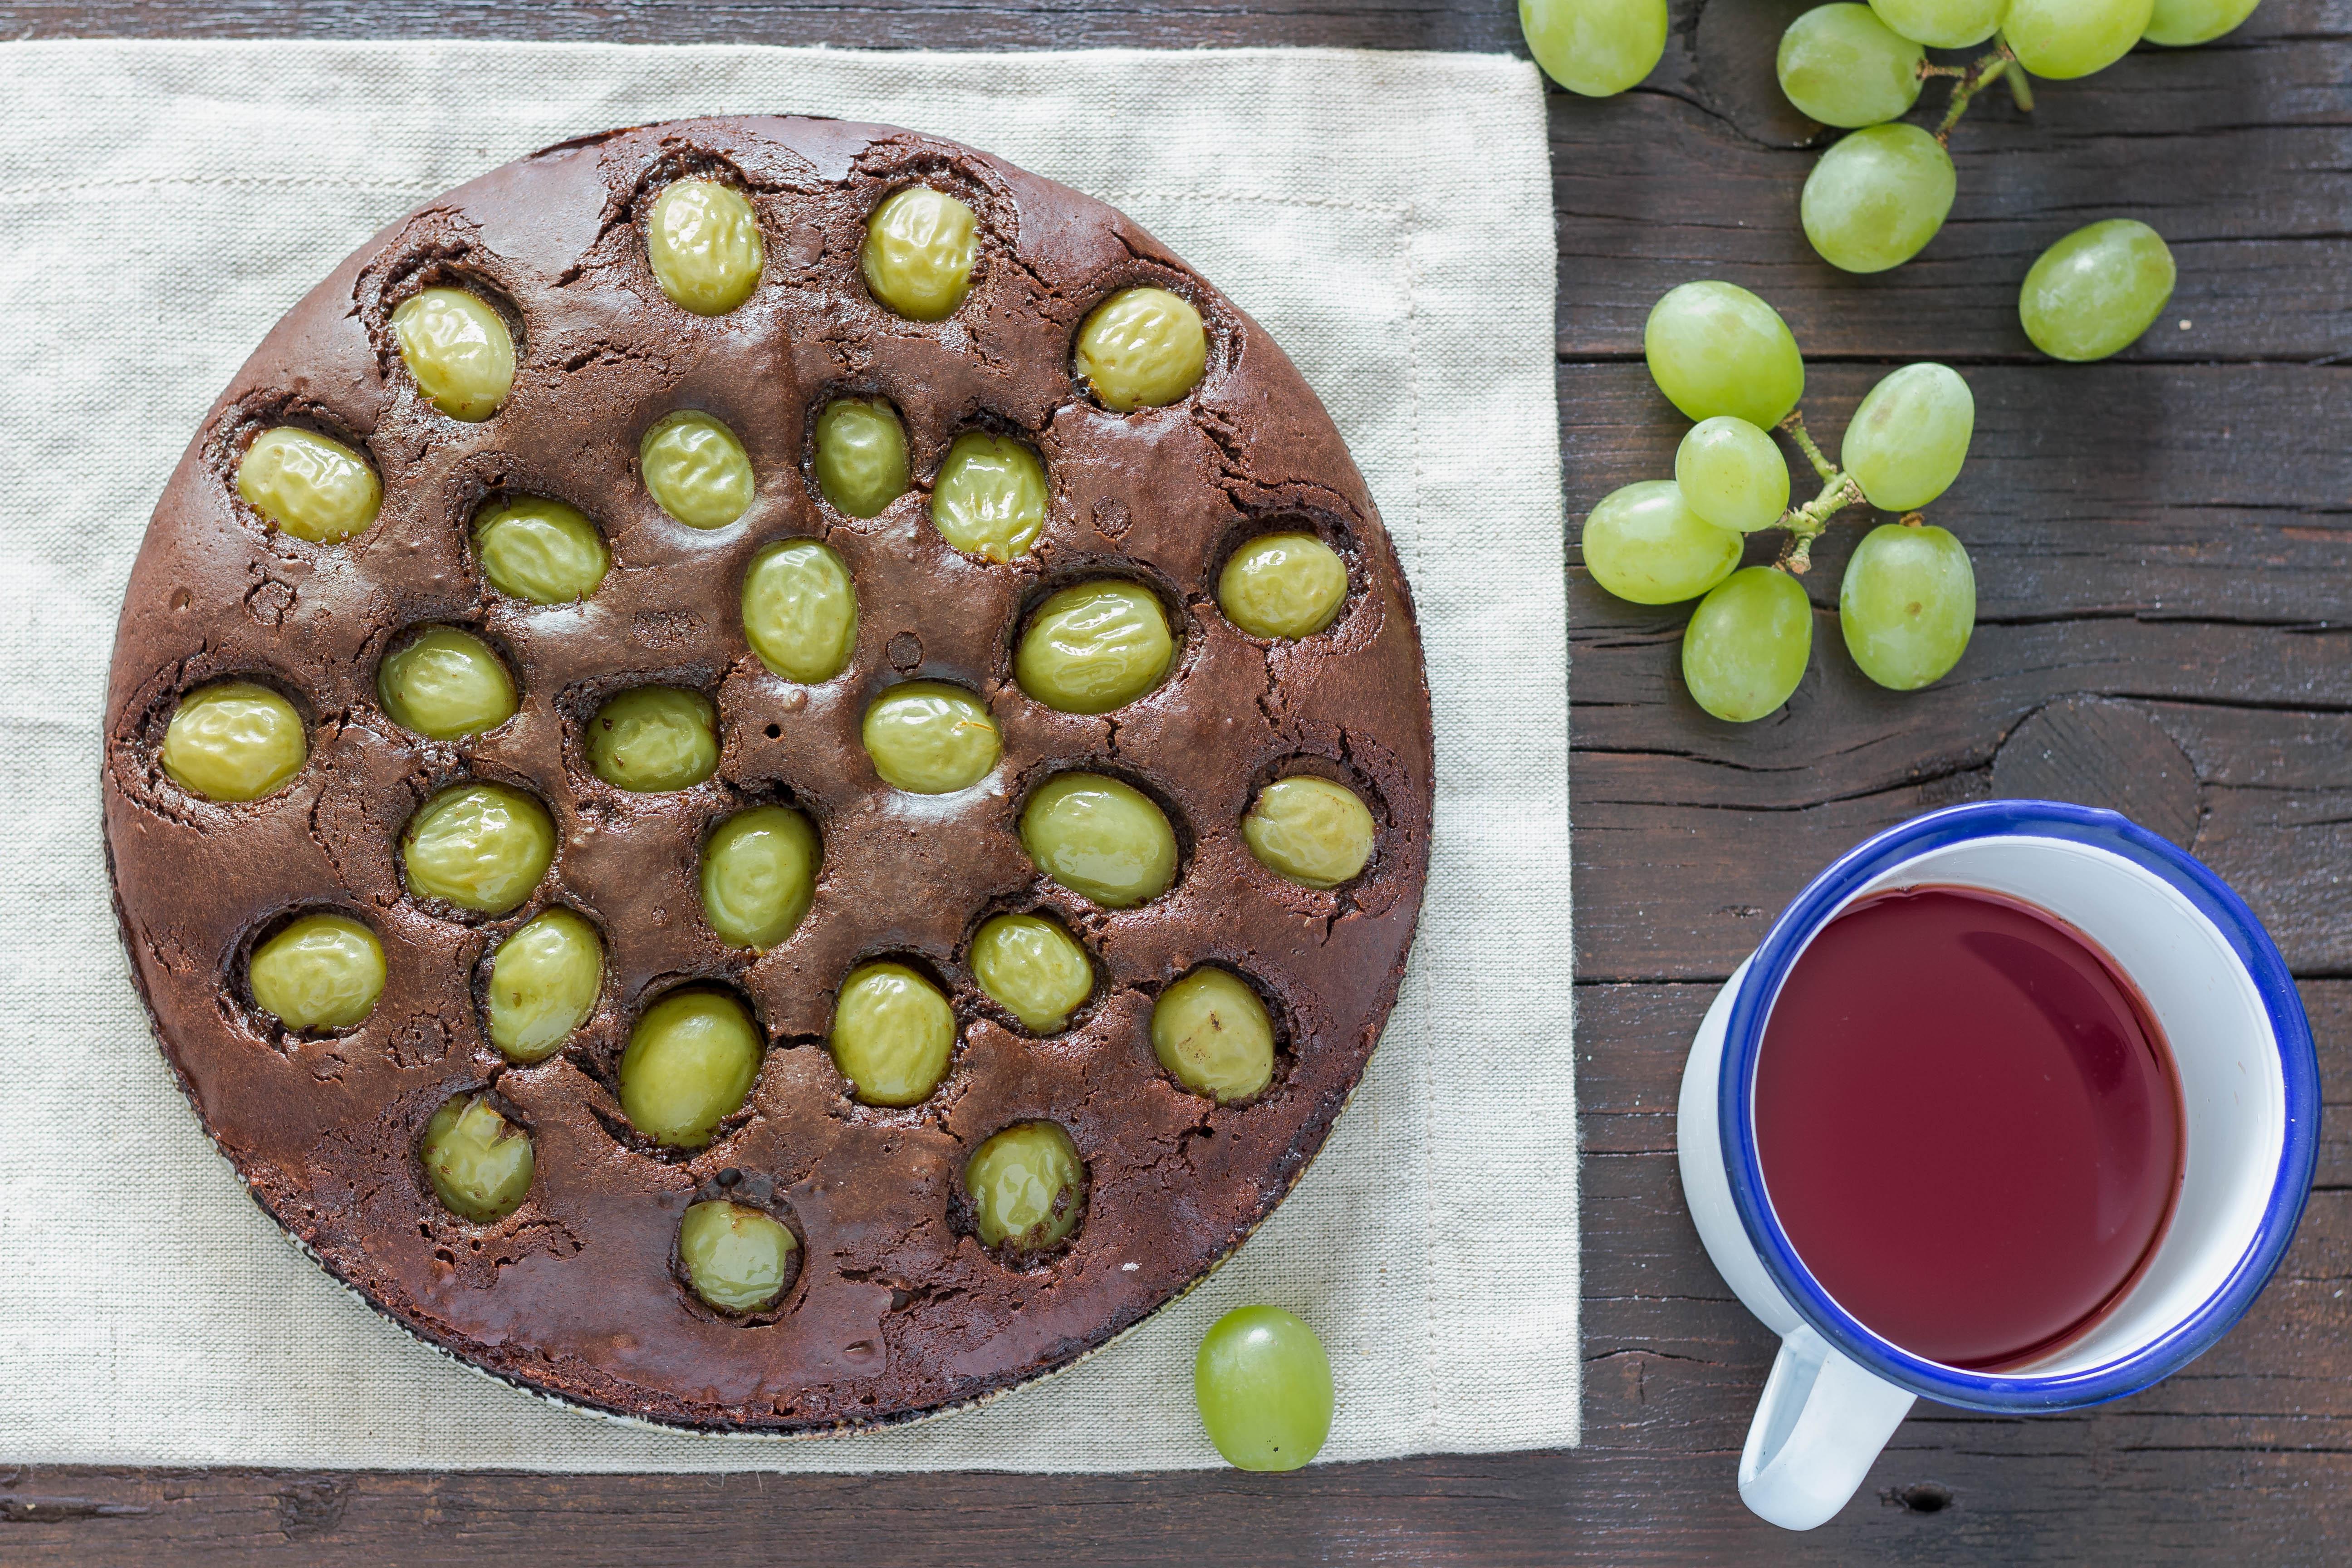 Torta ubriaca con uva